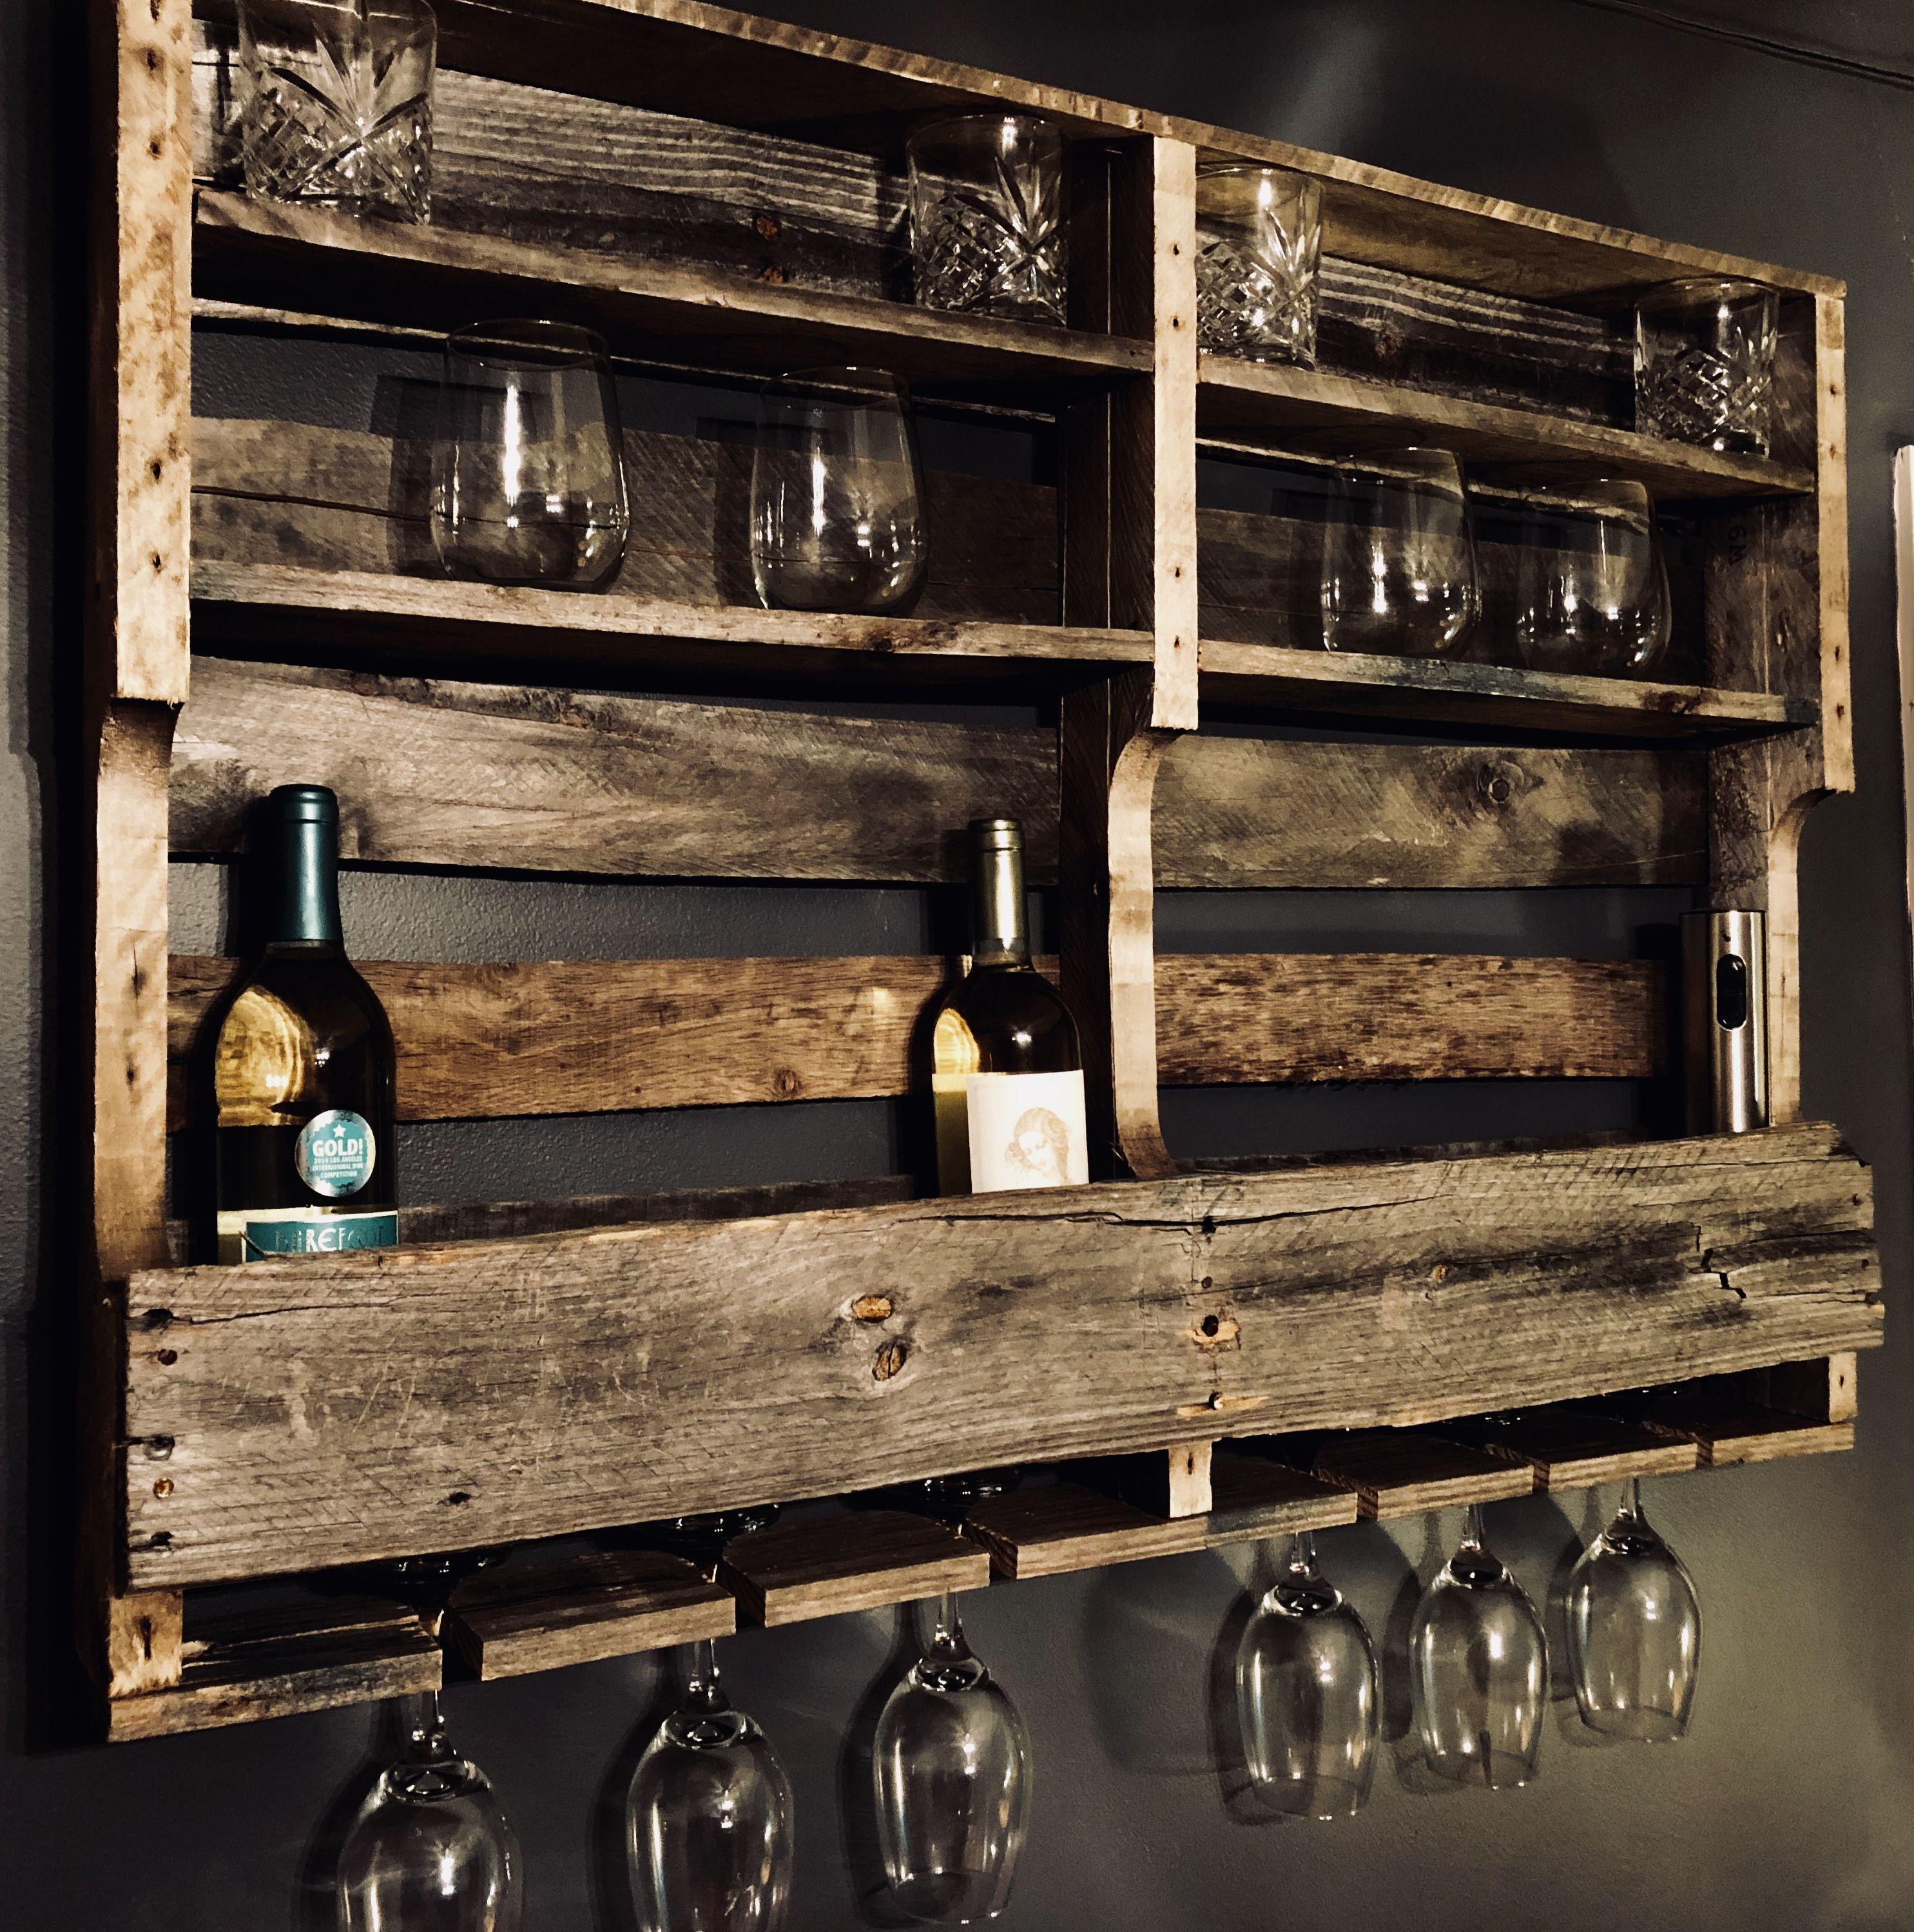 diy pallet wine rack diy projects pallet wine rack diy pallet wine pallett wine rack. Black Bedroom Furniture Sets. Home Design Ideas